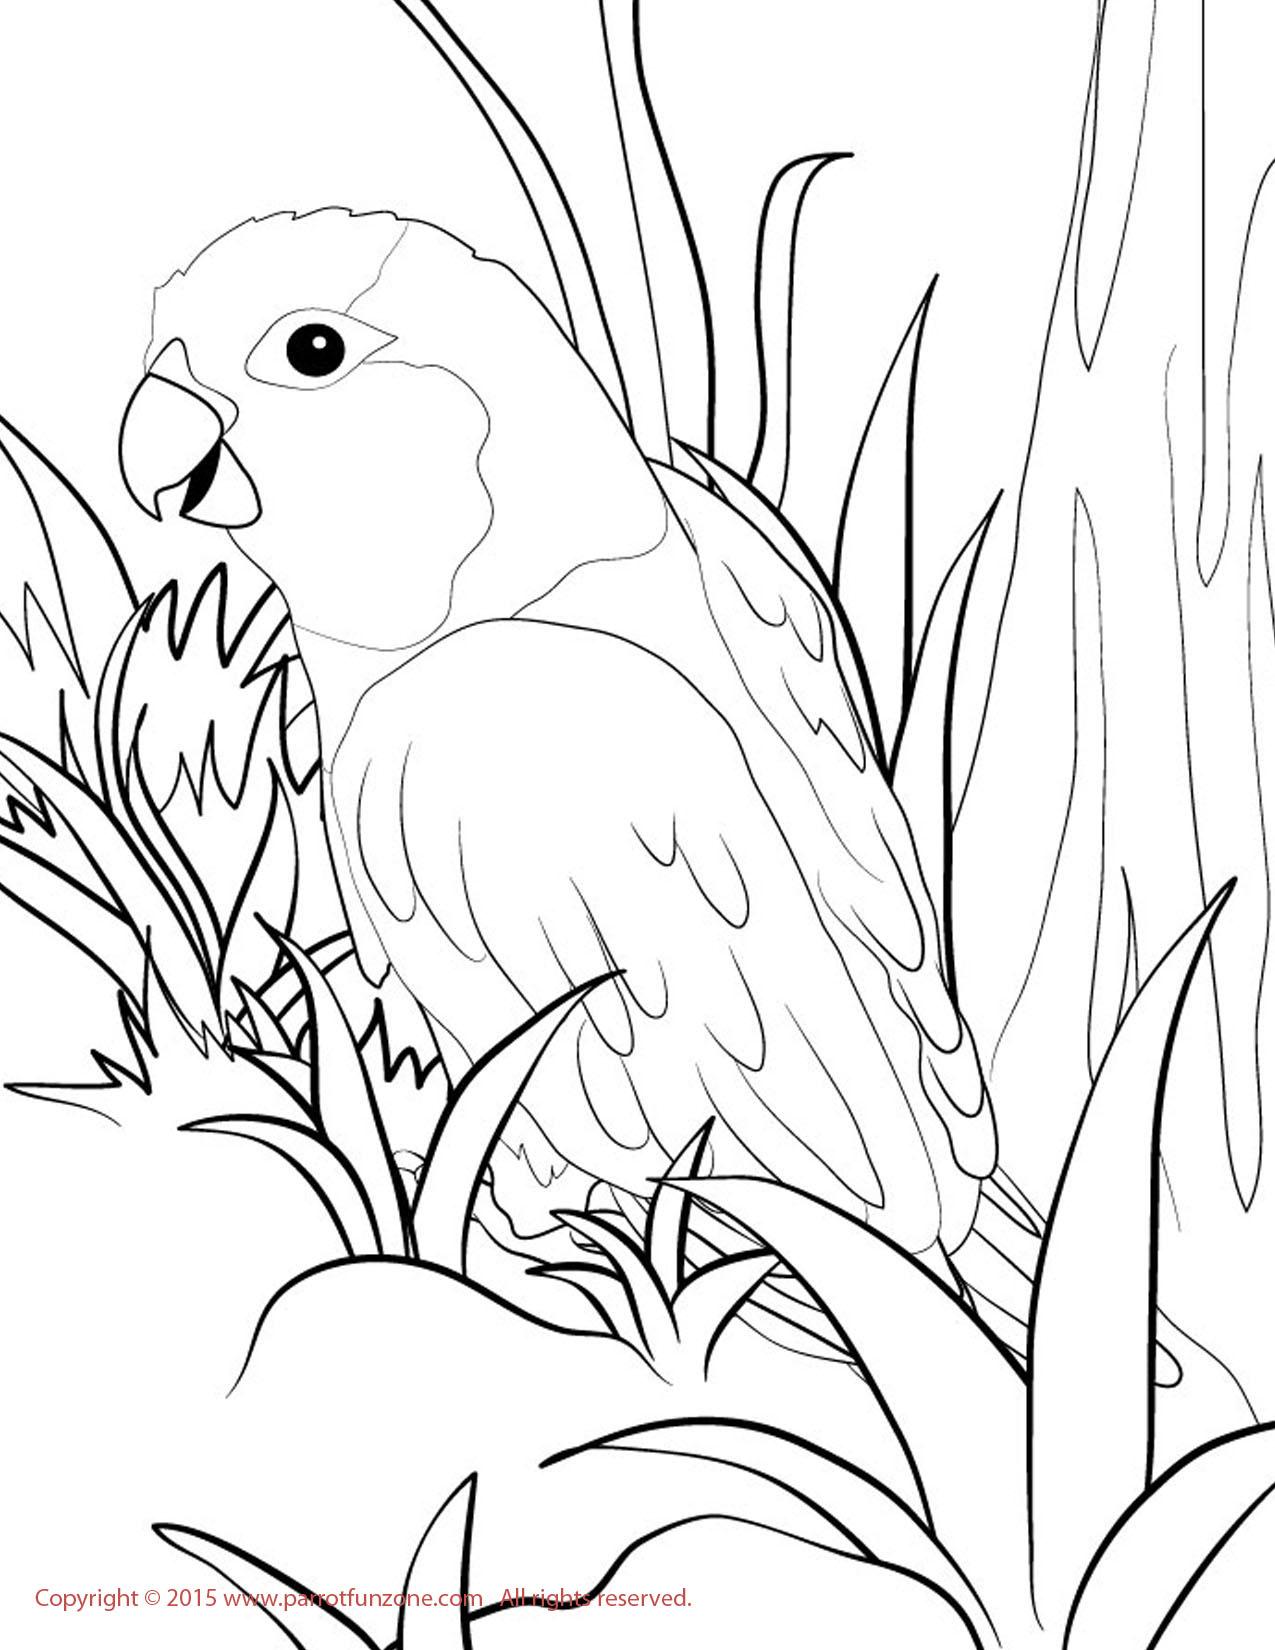 Conure coloring #18, Download drawings